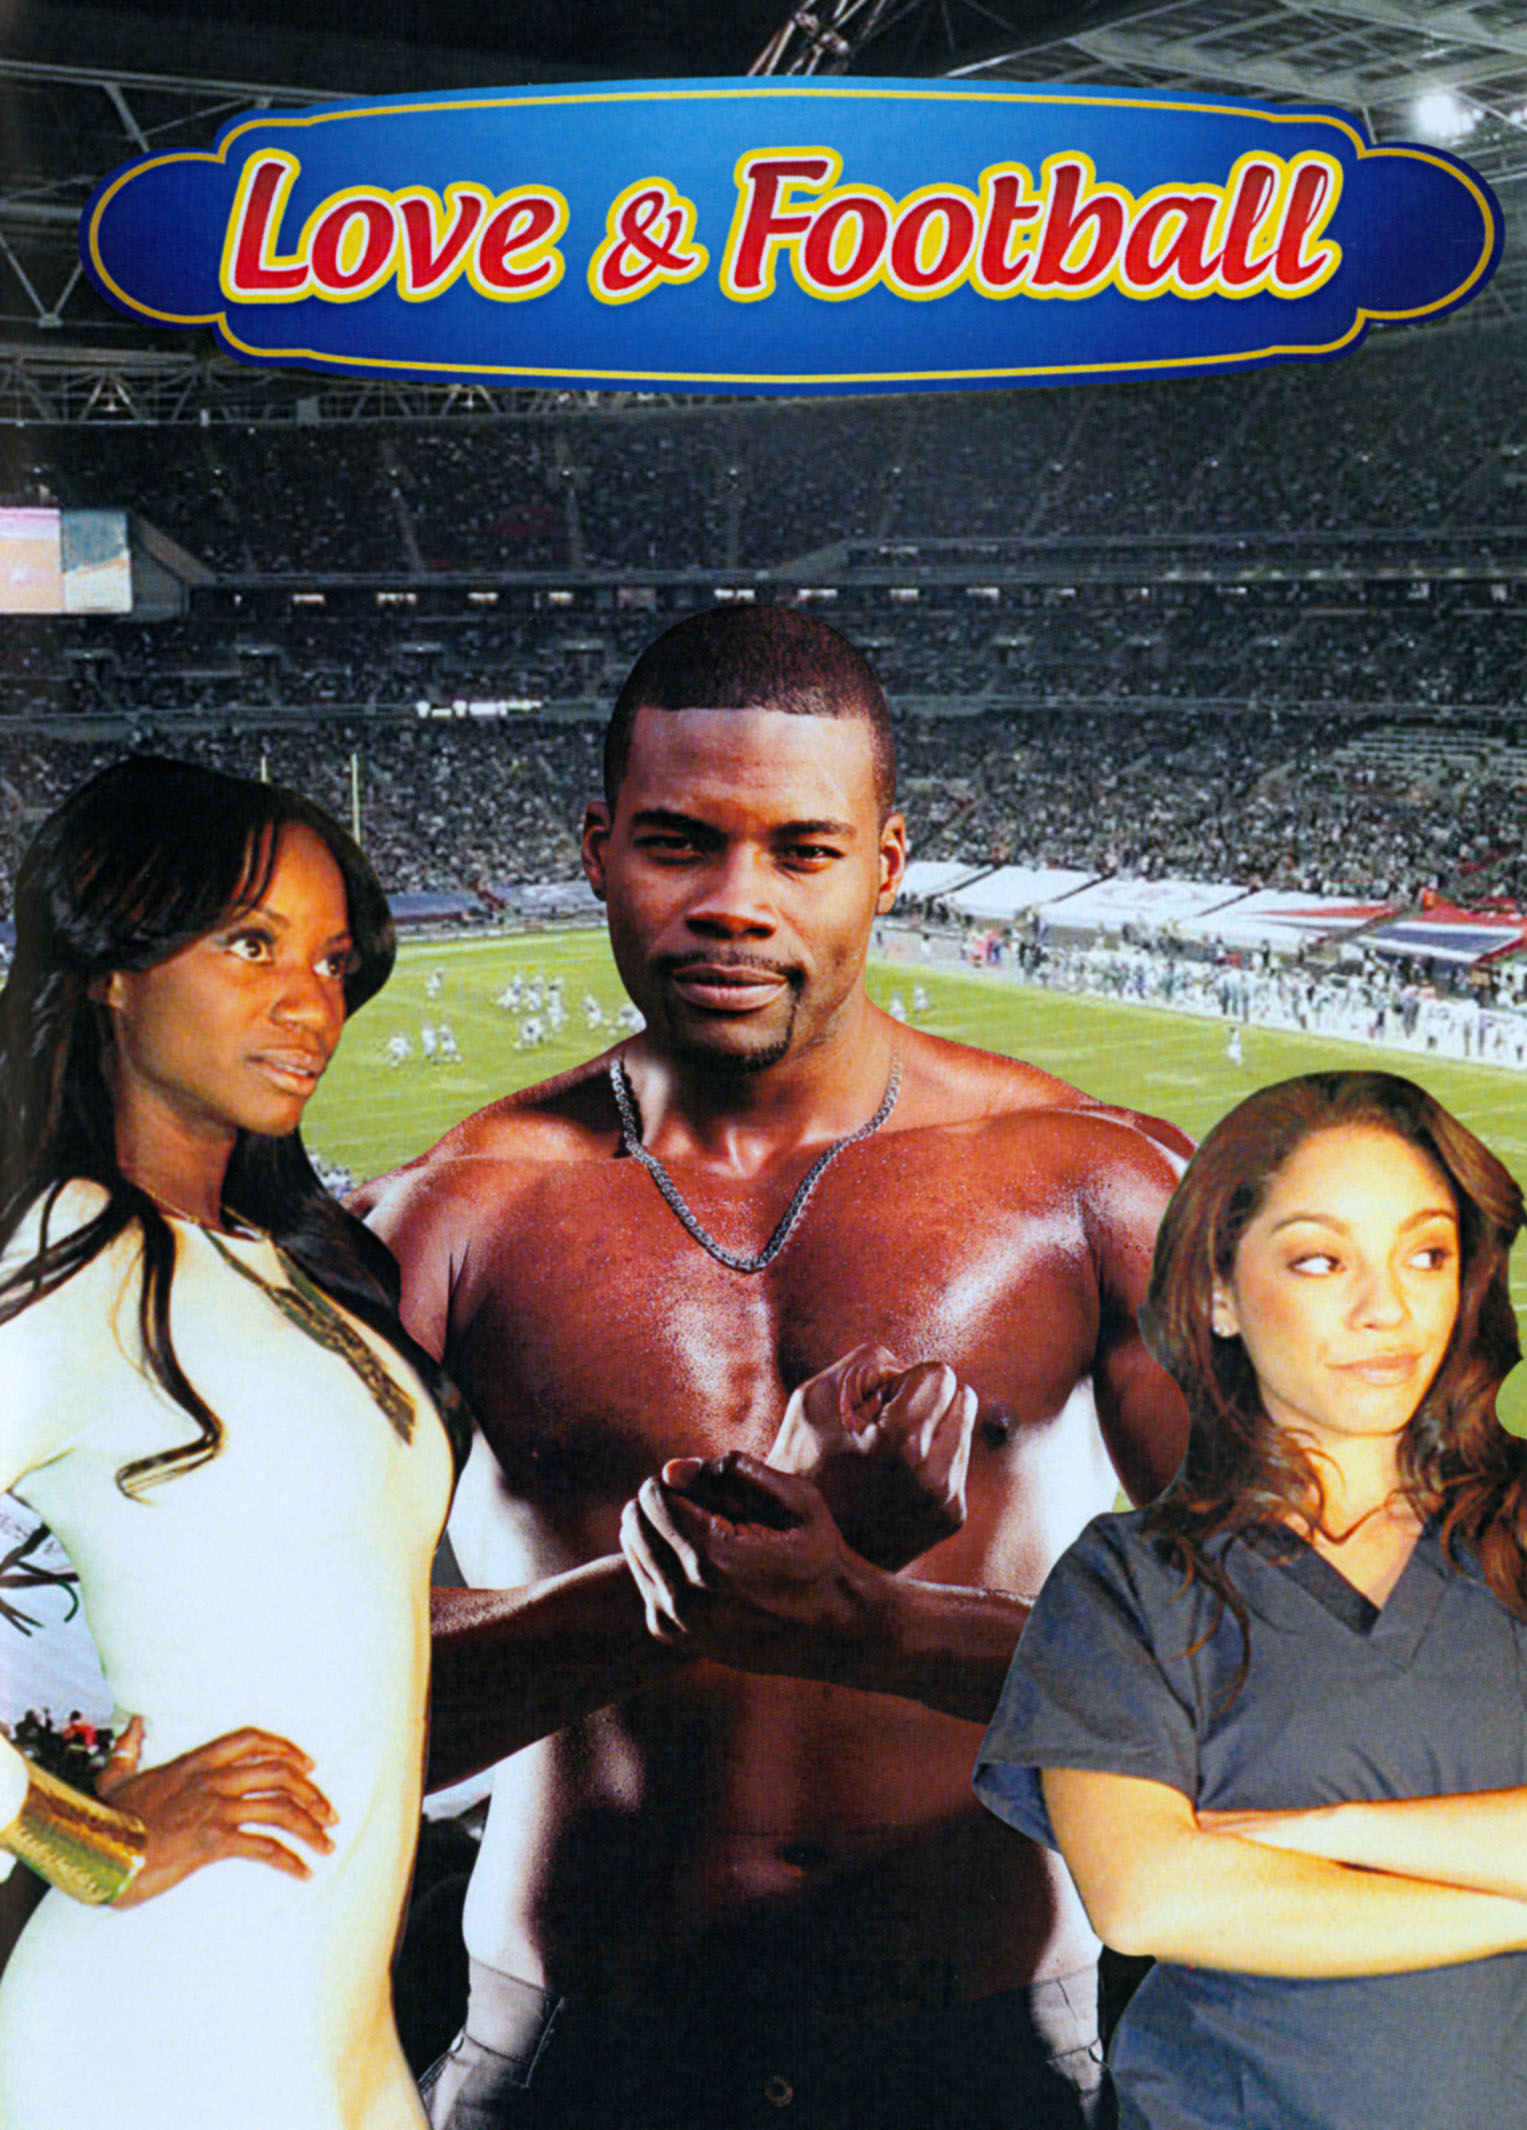 Love & Football